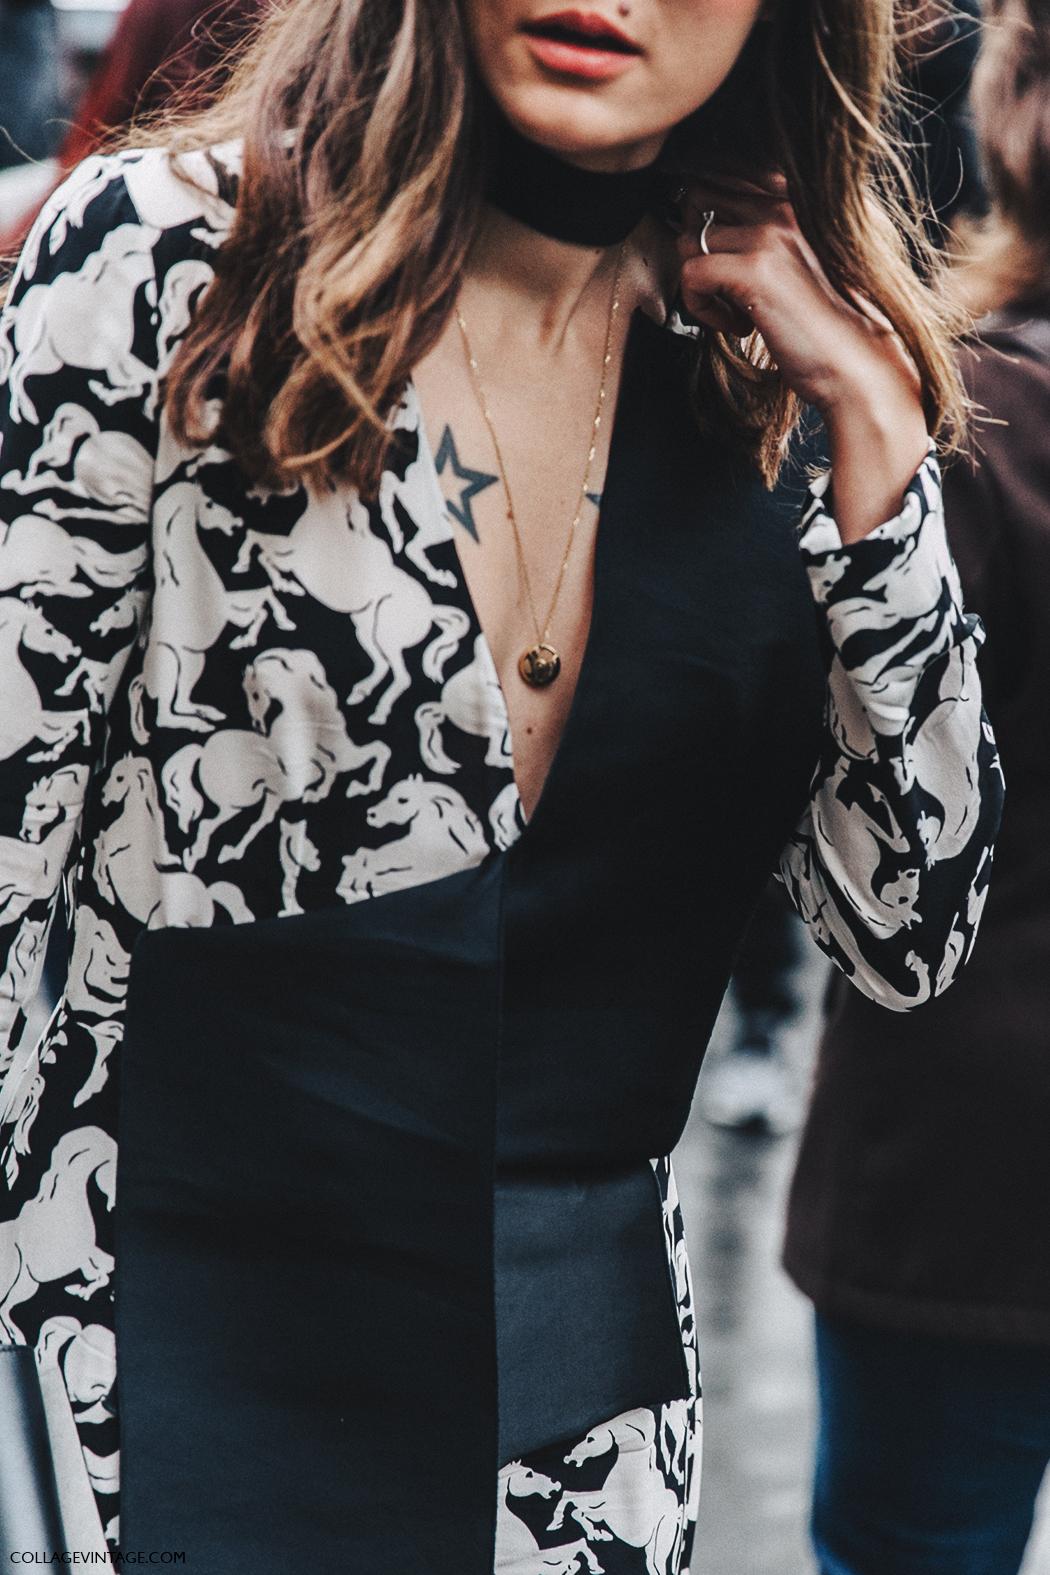 PFW-Paris_Fashion_Week_Fall_2016-Street_Style-Collage_Vintage-Stella_McCartney-Eleonora_Carisi-